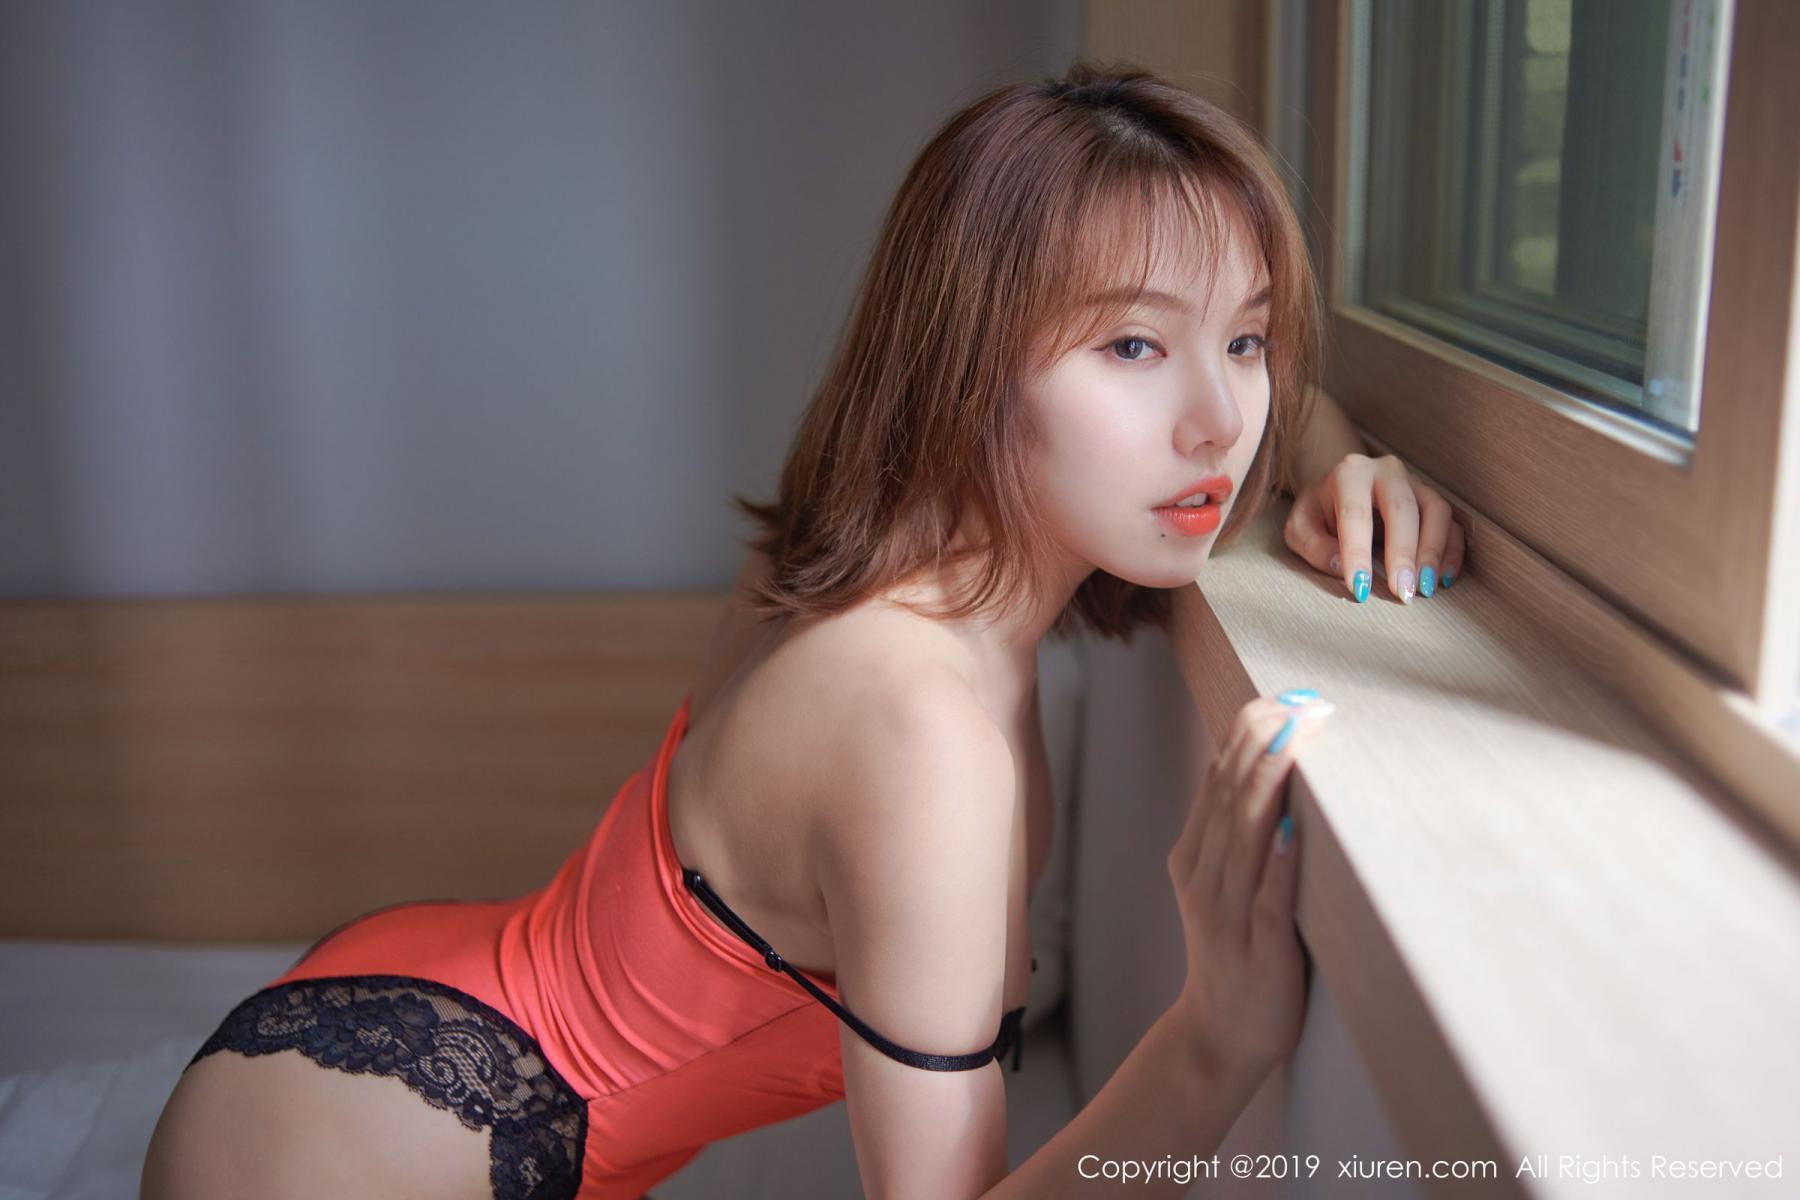 [XiuRen] Vol.1684 Huang Le Ran 40P, Huang Le Ran, Underwear, Xiuren